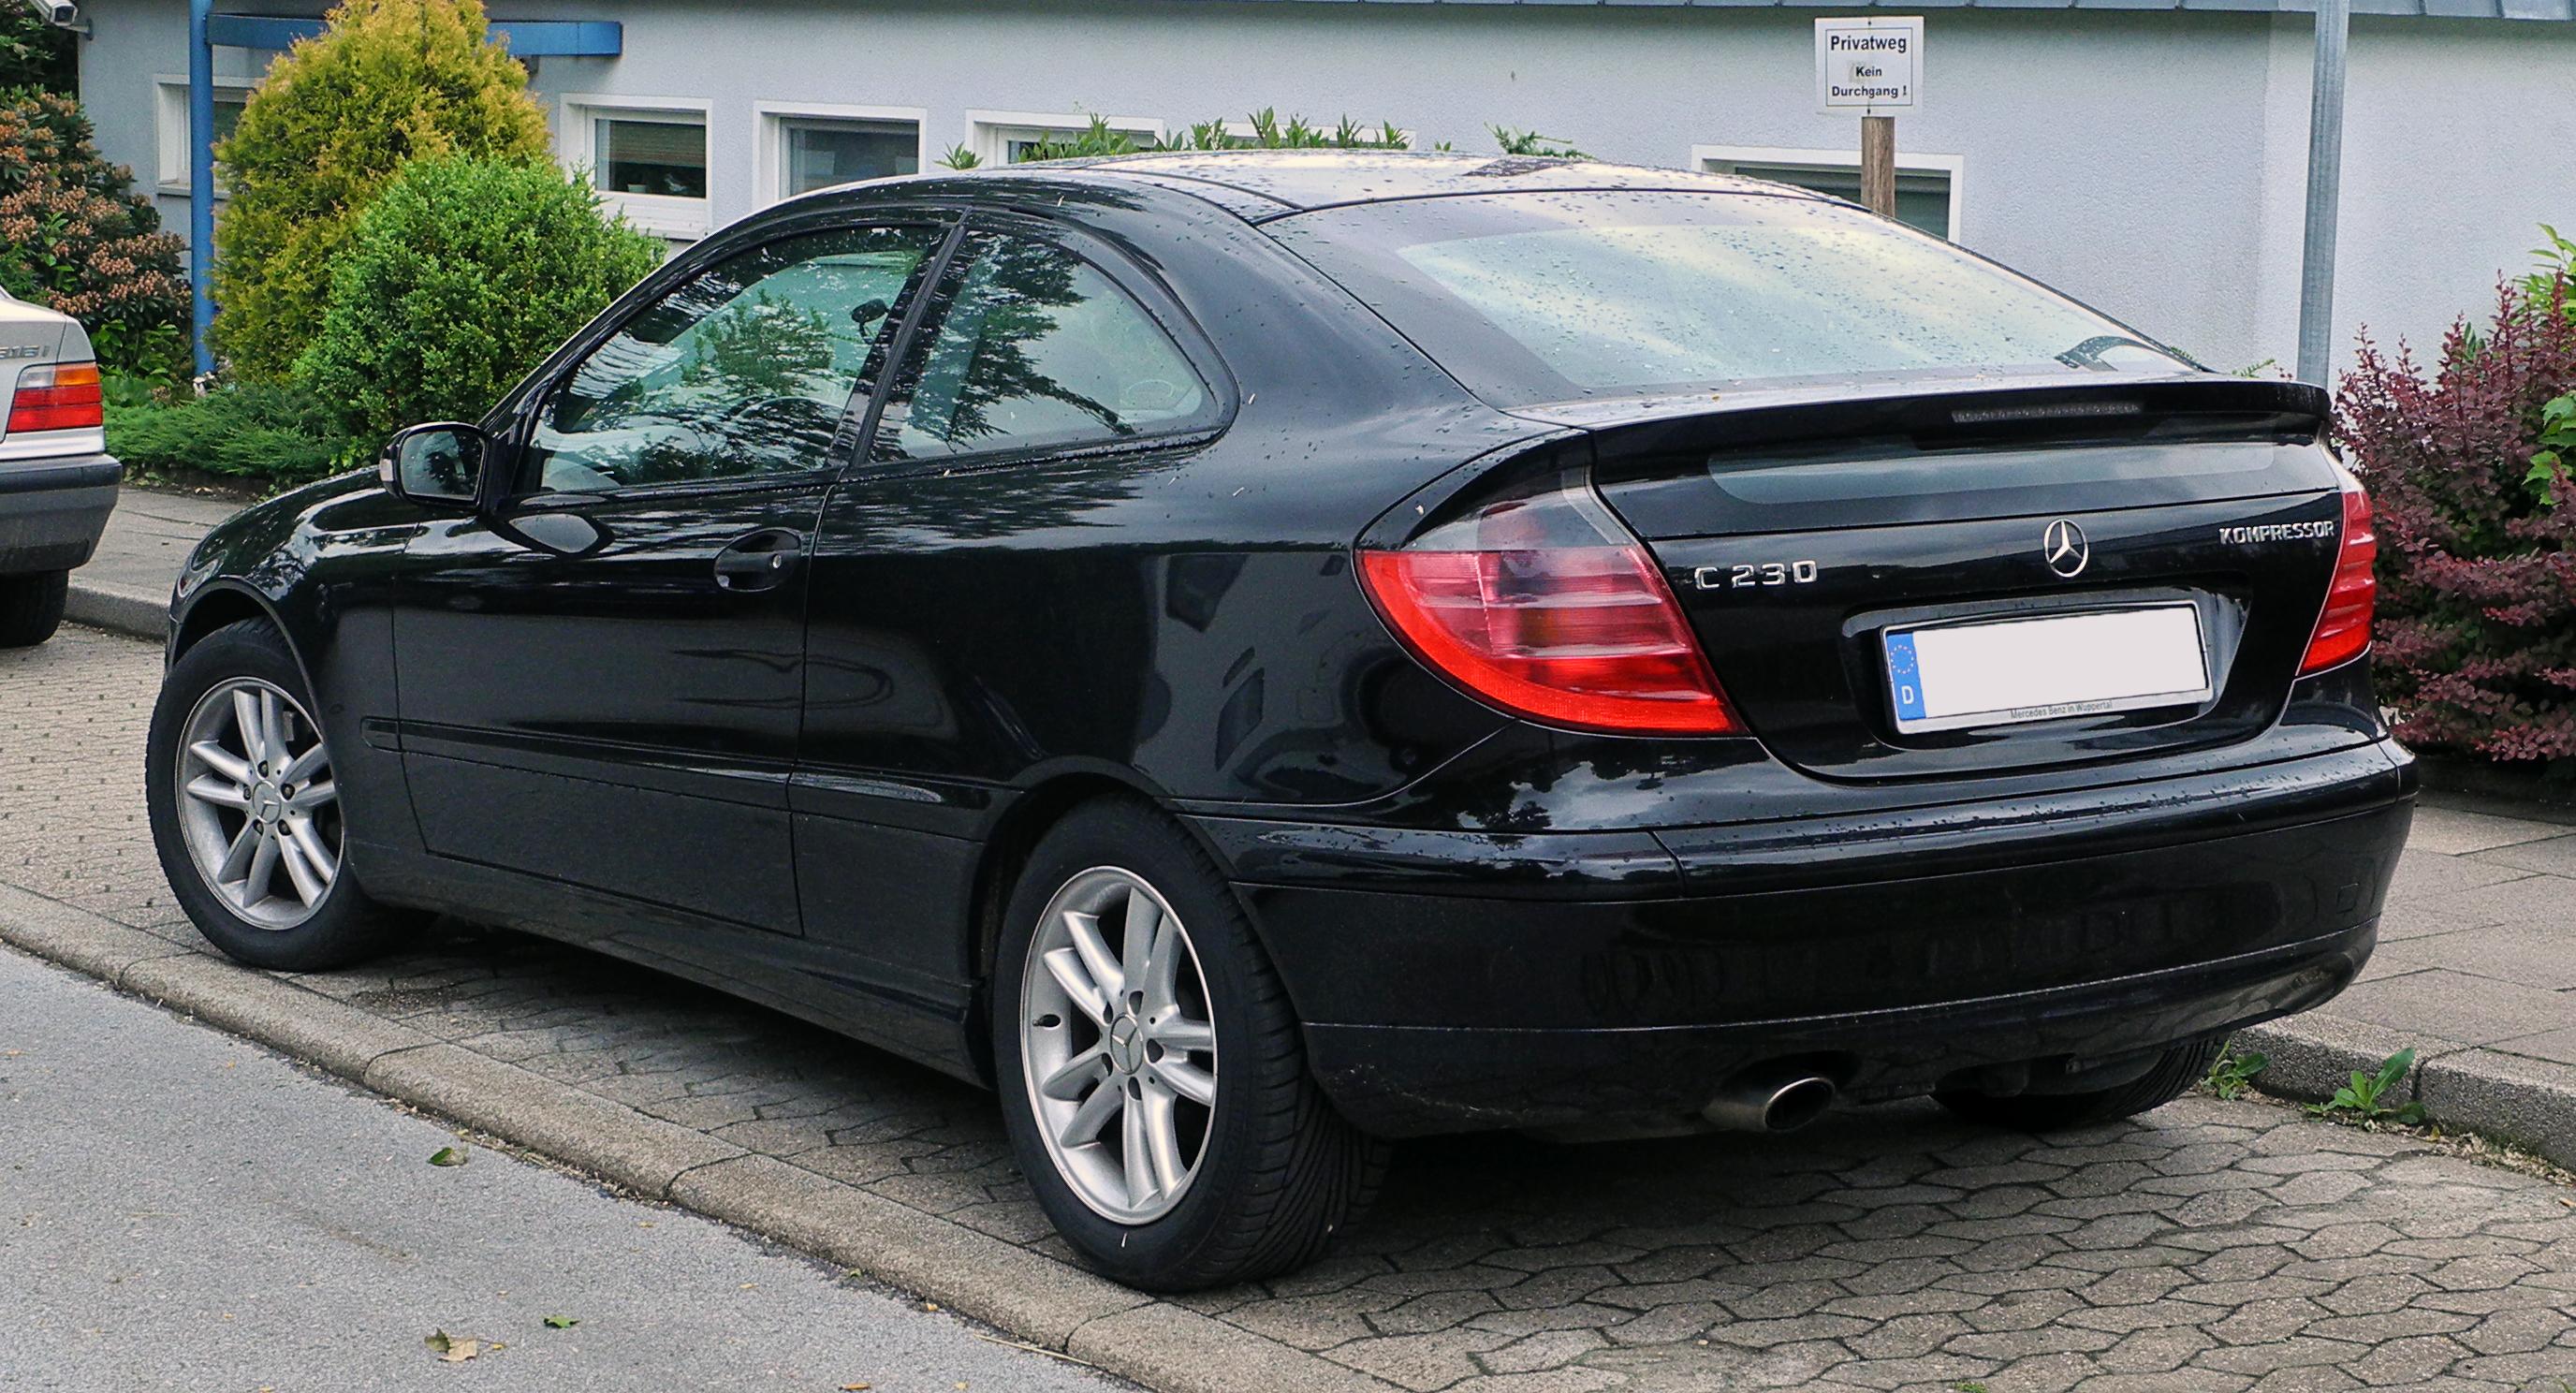 Mercedes benz c 230 kompressor photos reviews news for Buy my mercedes benz